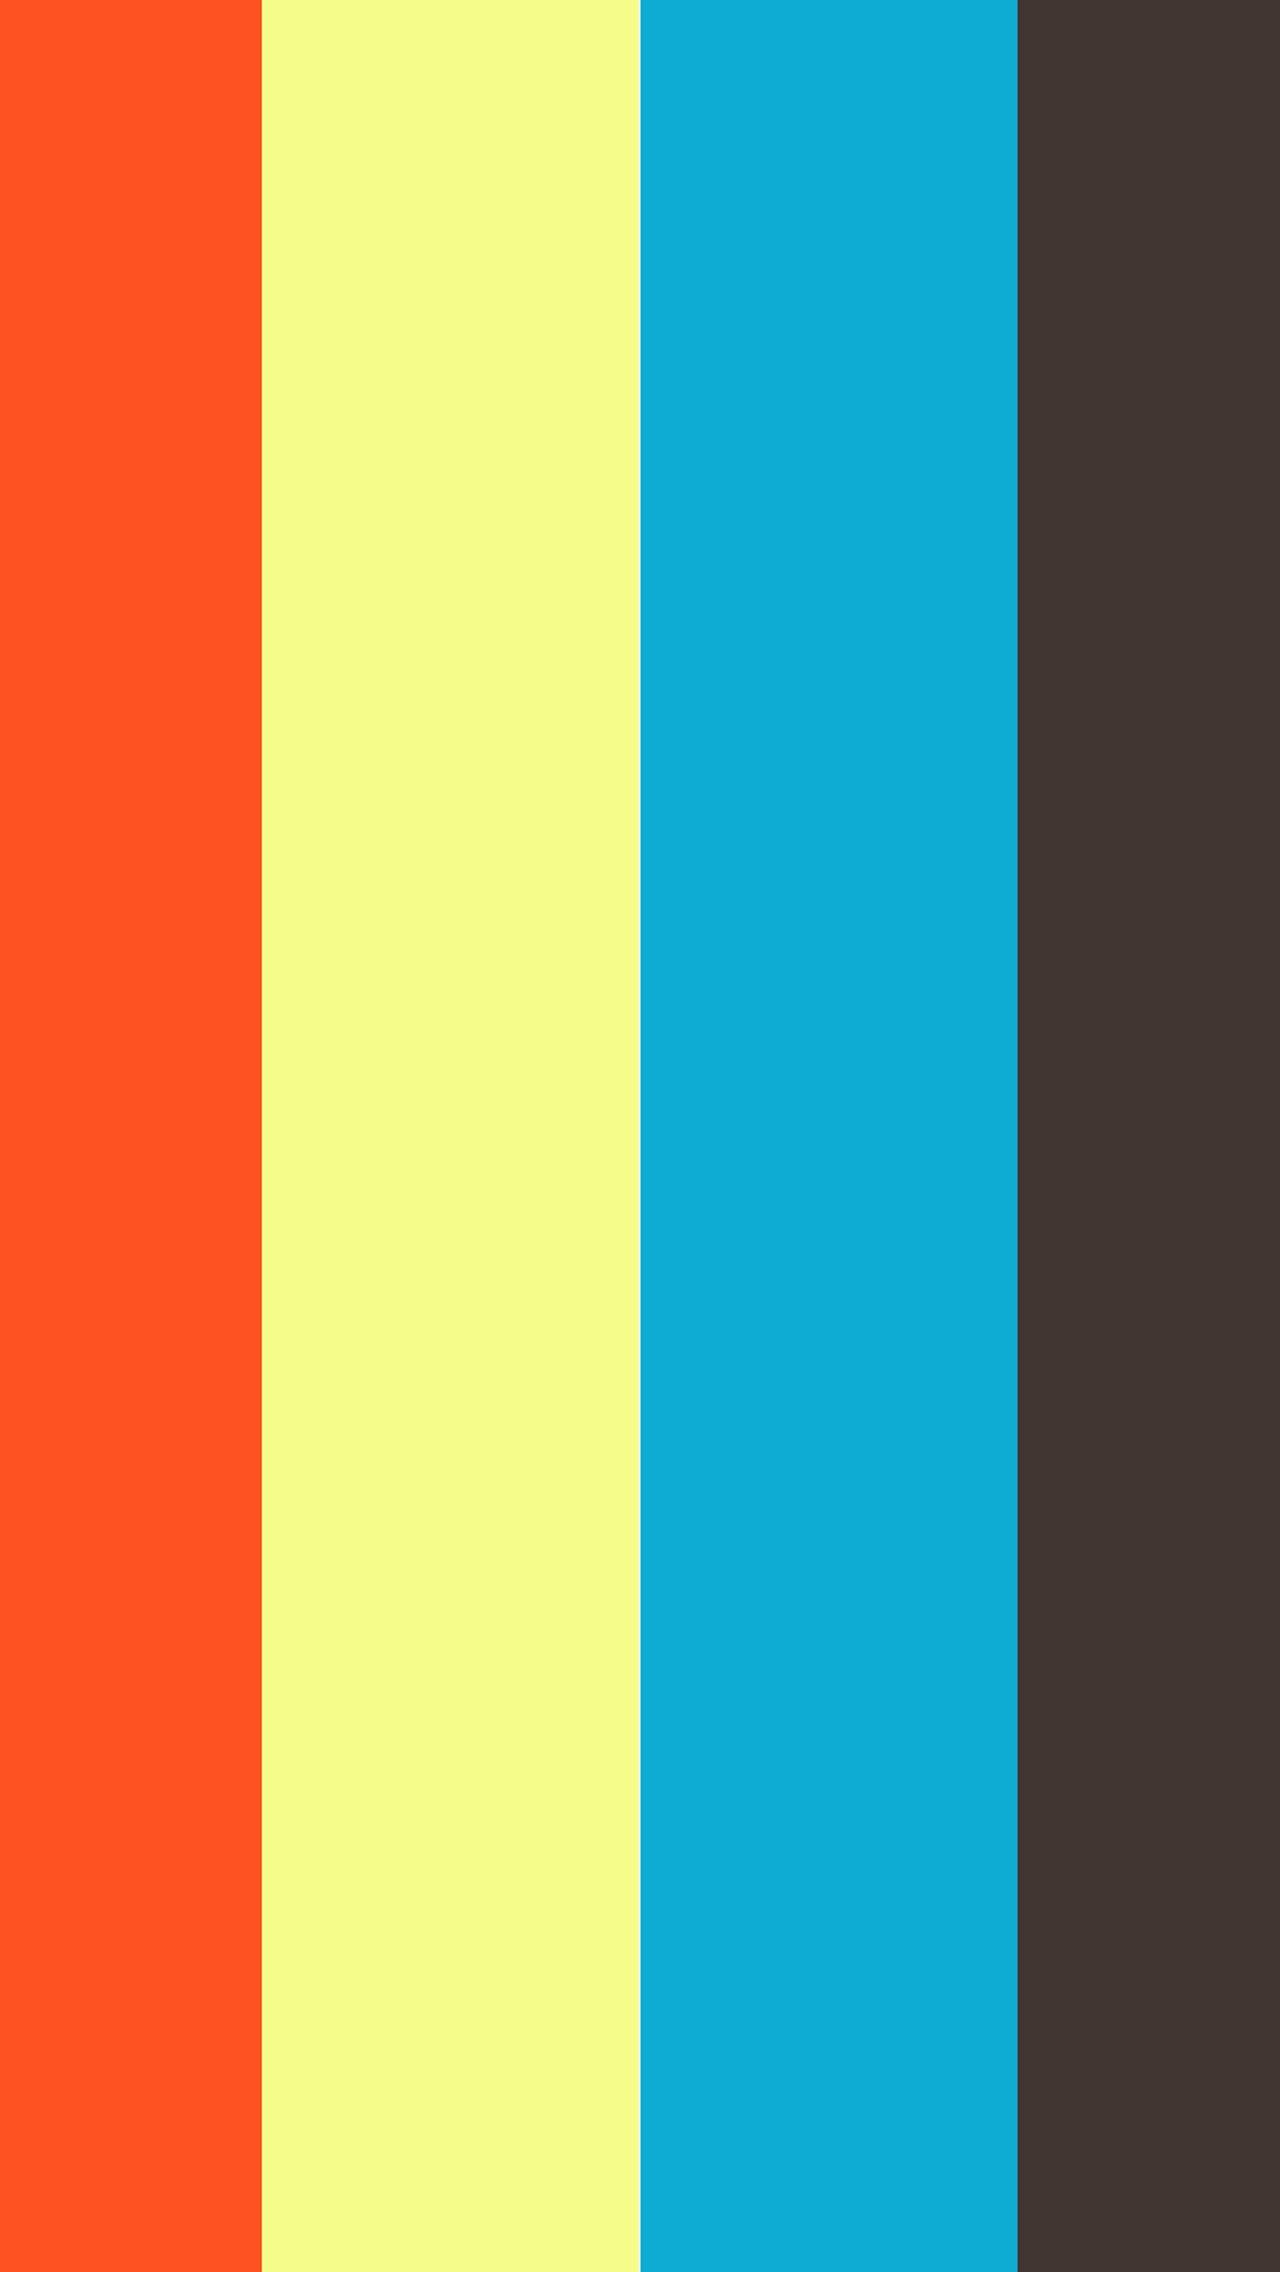 Solstice equinox 48h28m18s film 2008 by jeffrey blondes on vimeo - Equinoxe film x ...